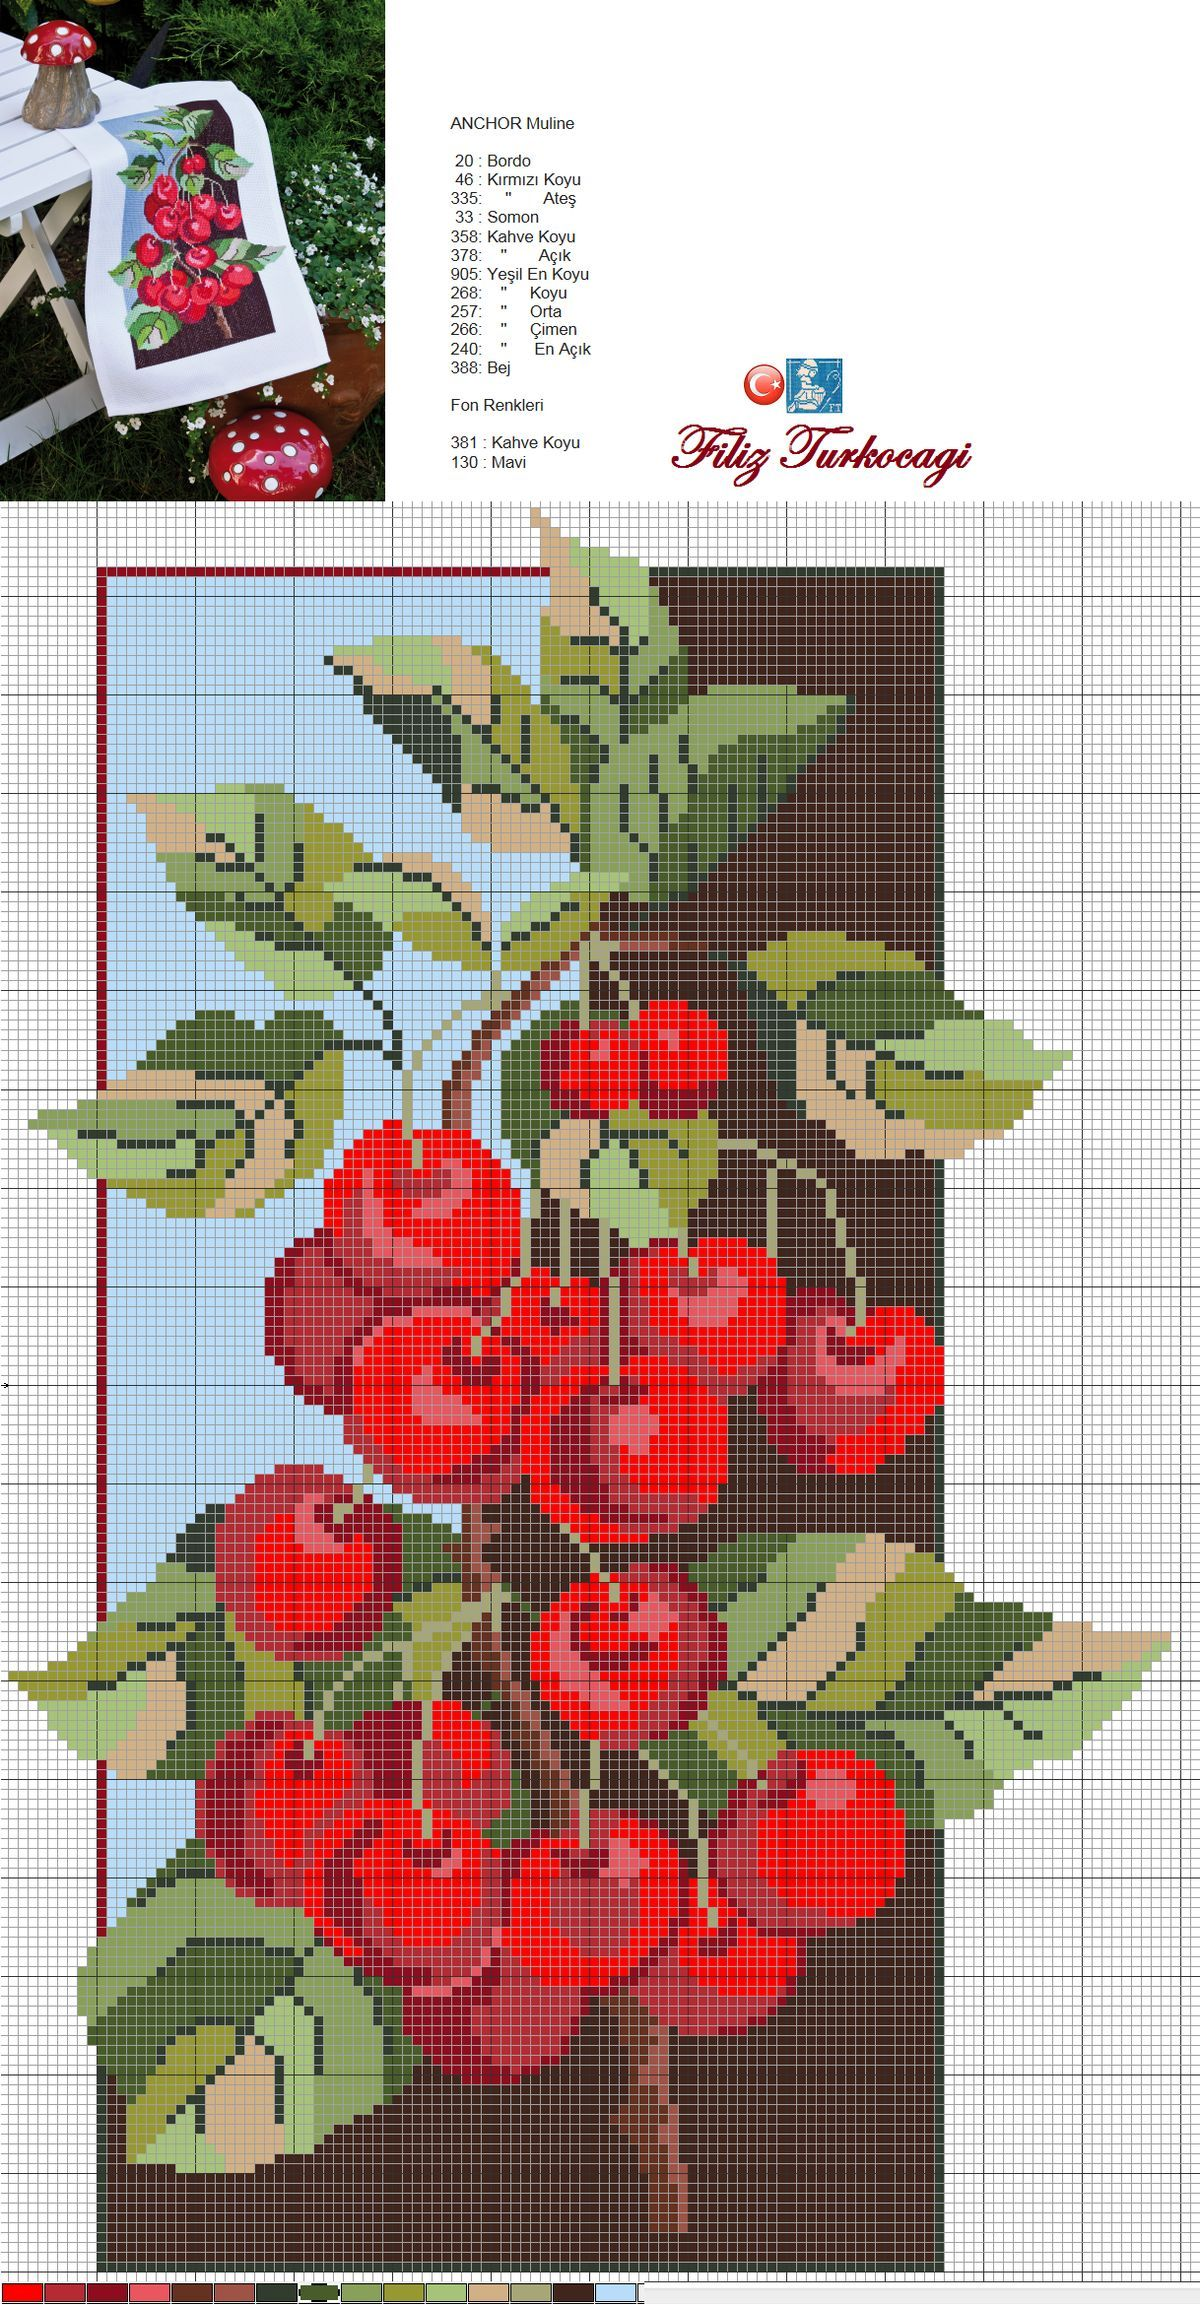 b69eff36d58e12cbed0c24295c0001a6.jpg 1.200×2.305 piksel